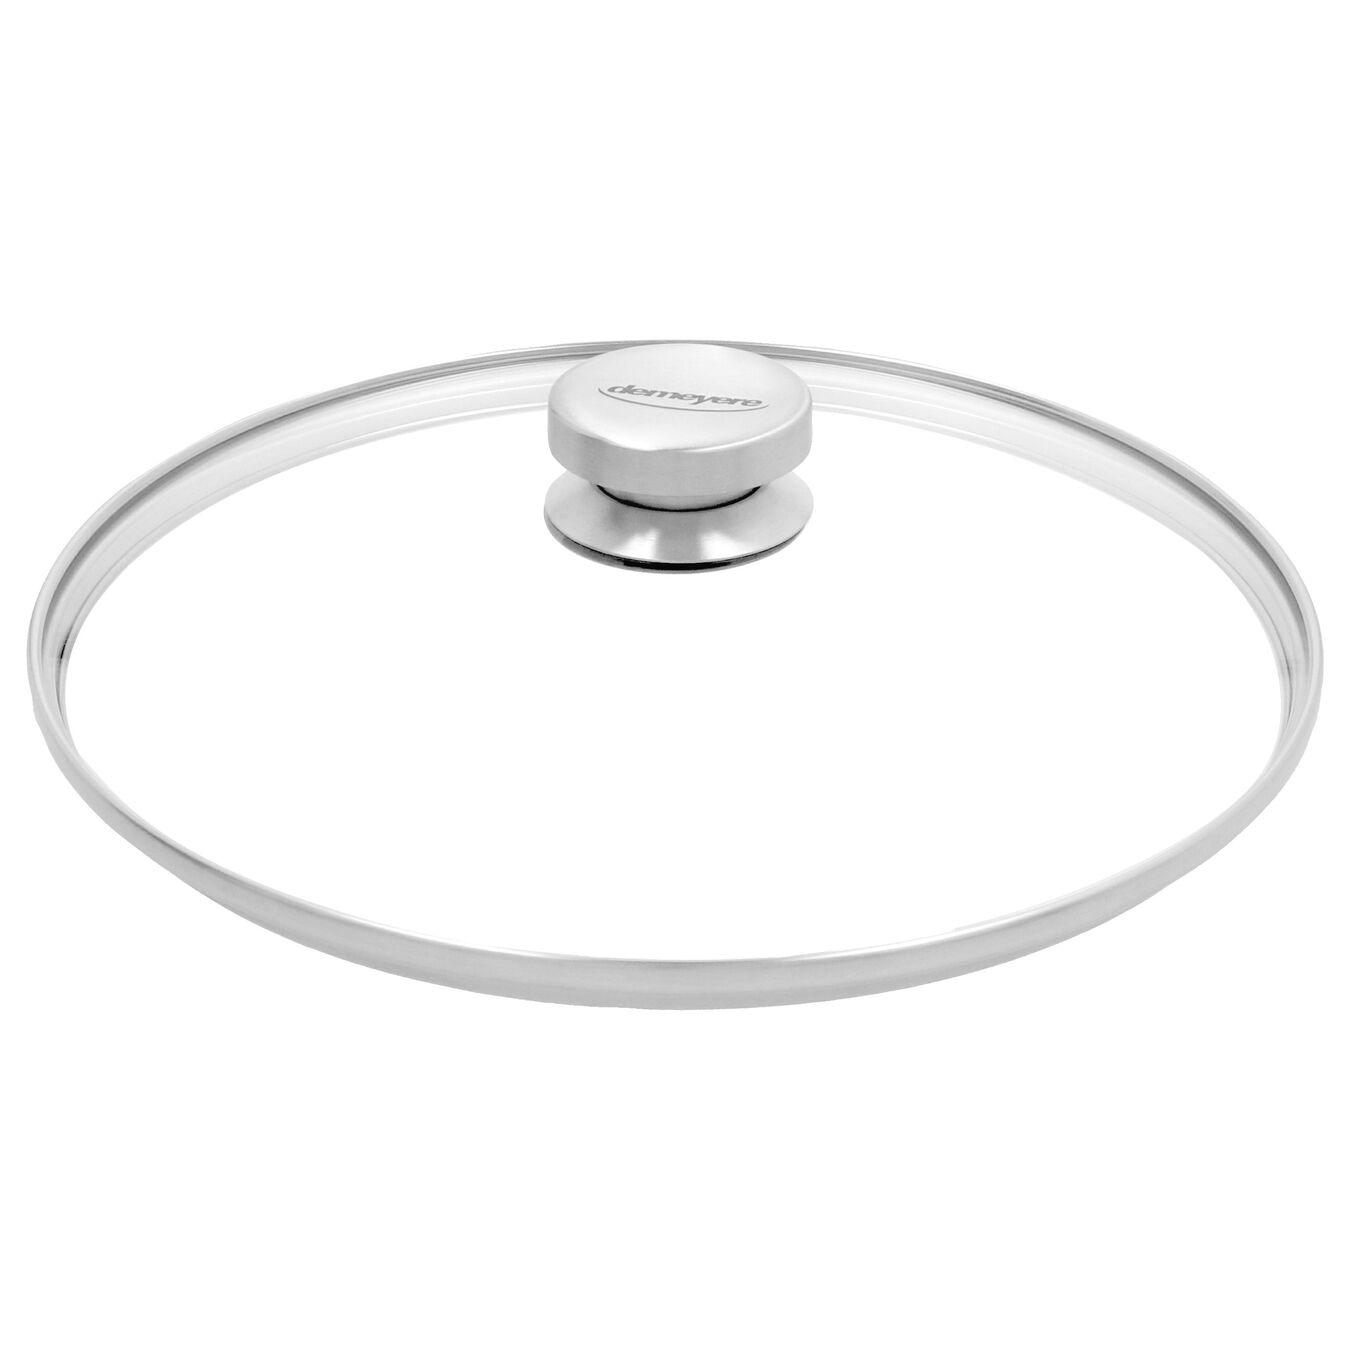 Kookpan met glazen deksel 24 cm / 2.8 l,,large 7